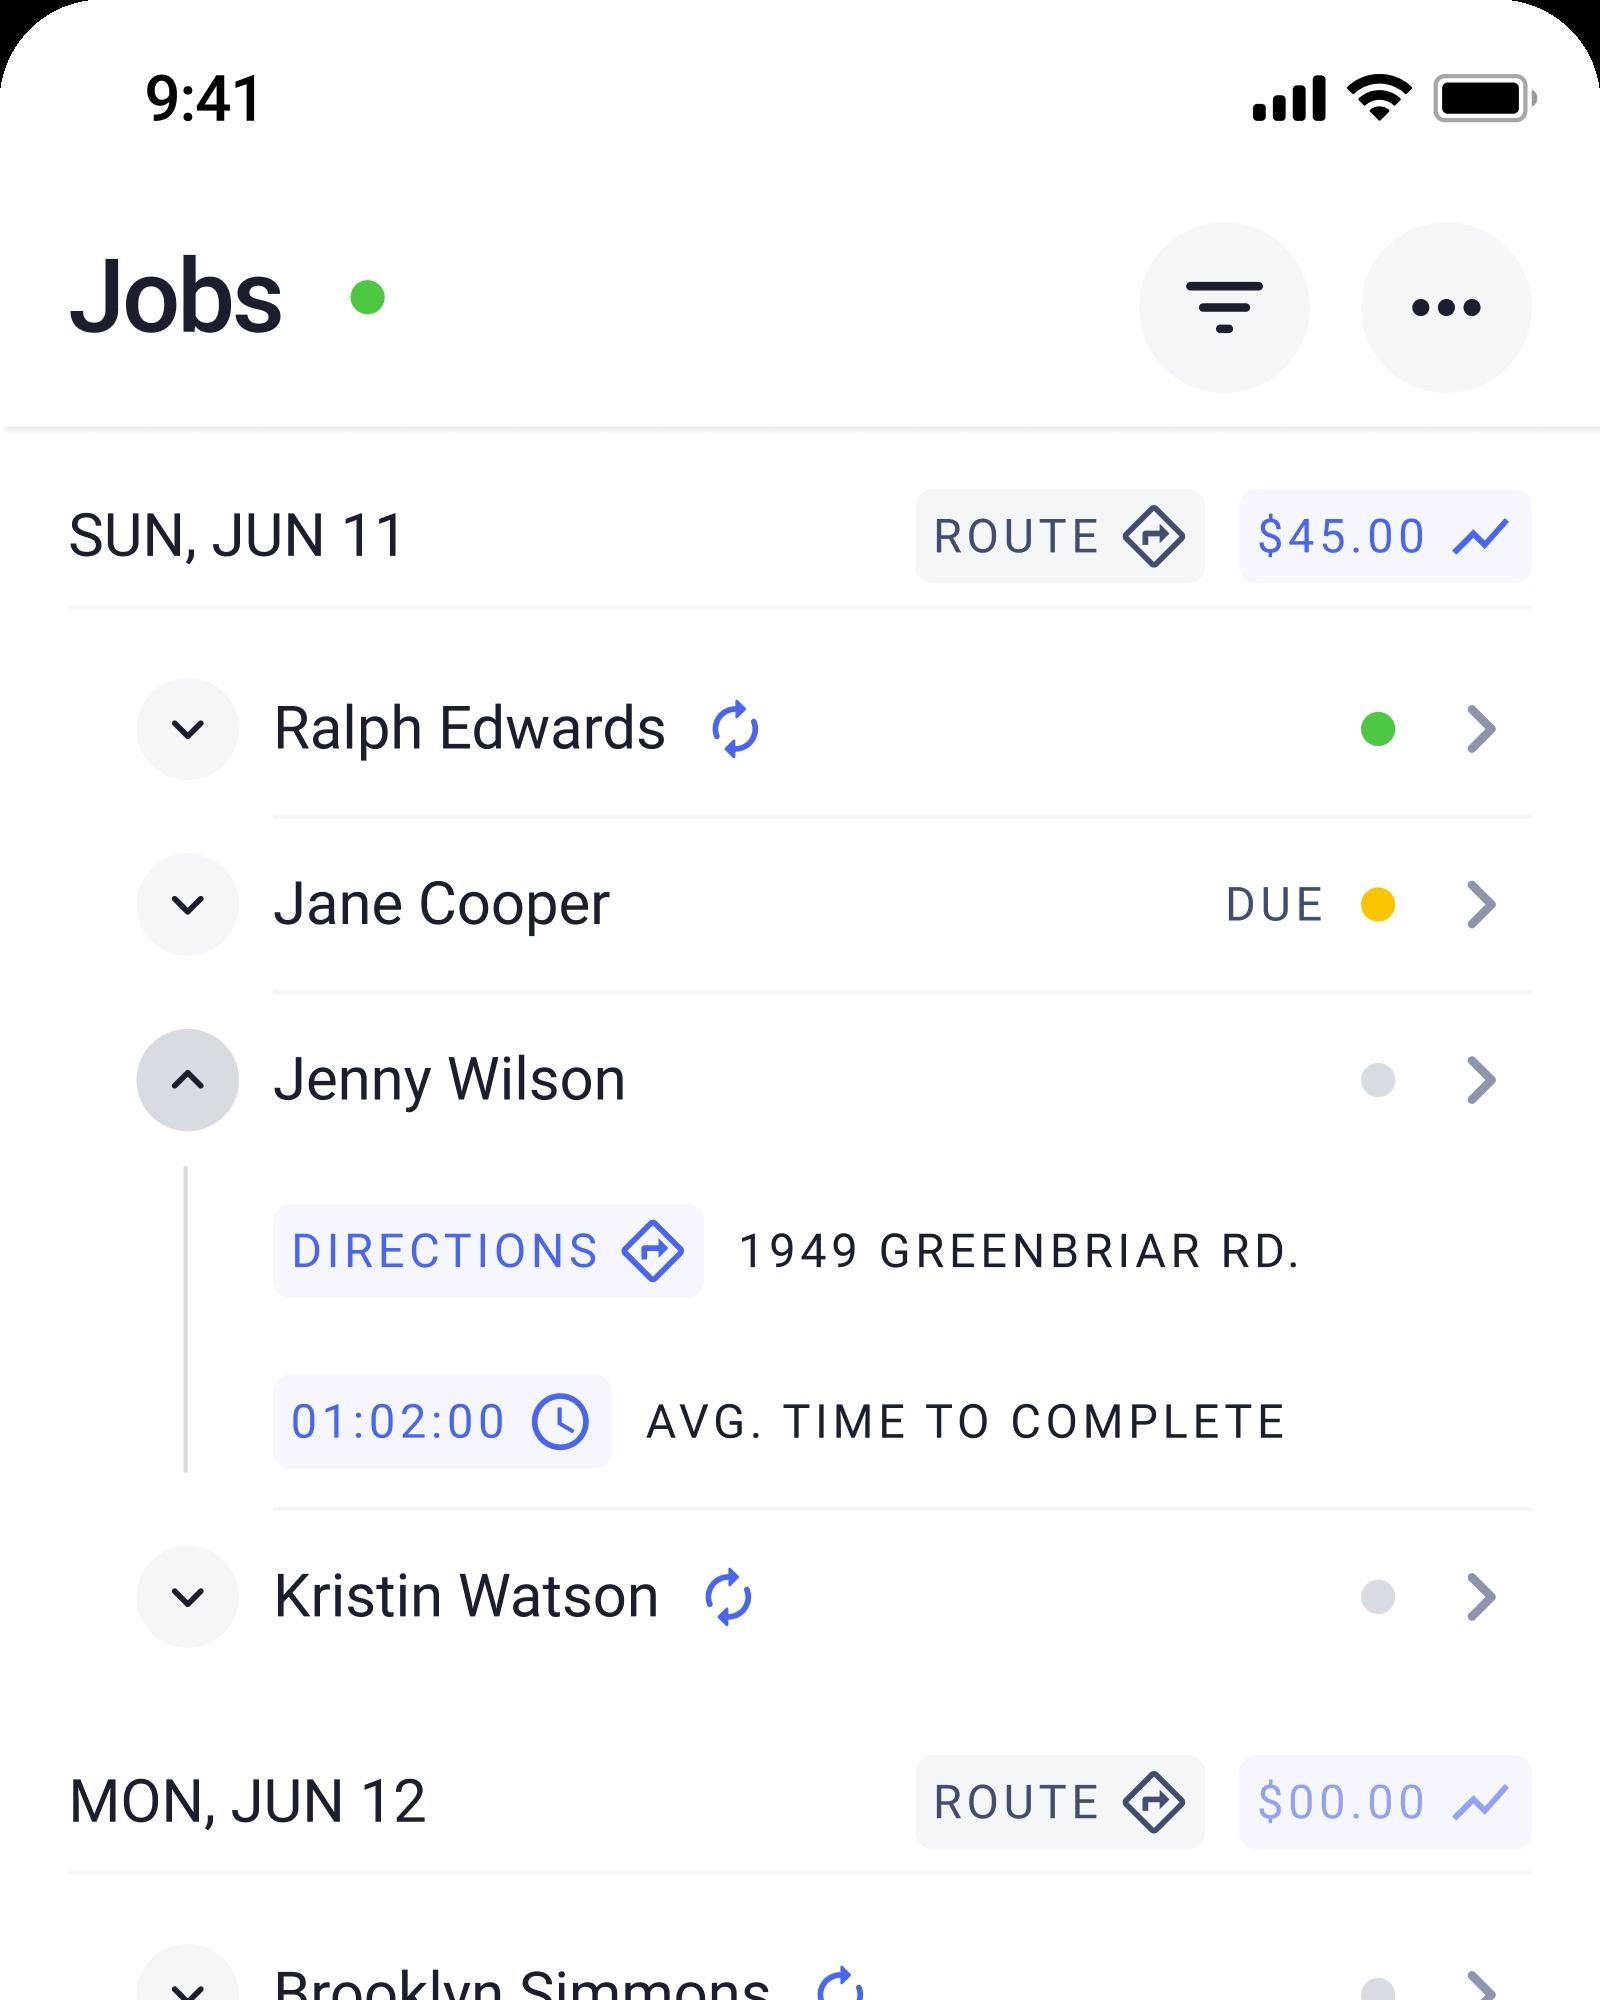 Screenshot of the Job Schedule screen in the Check App